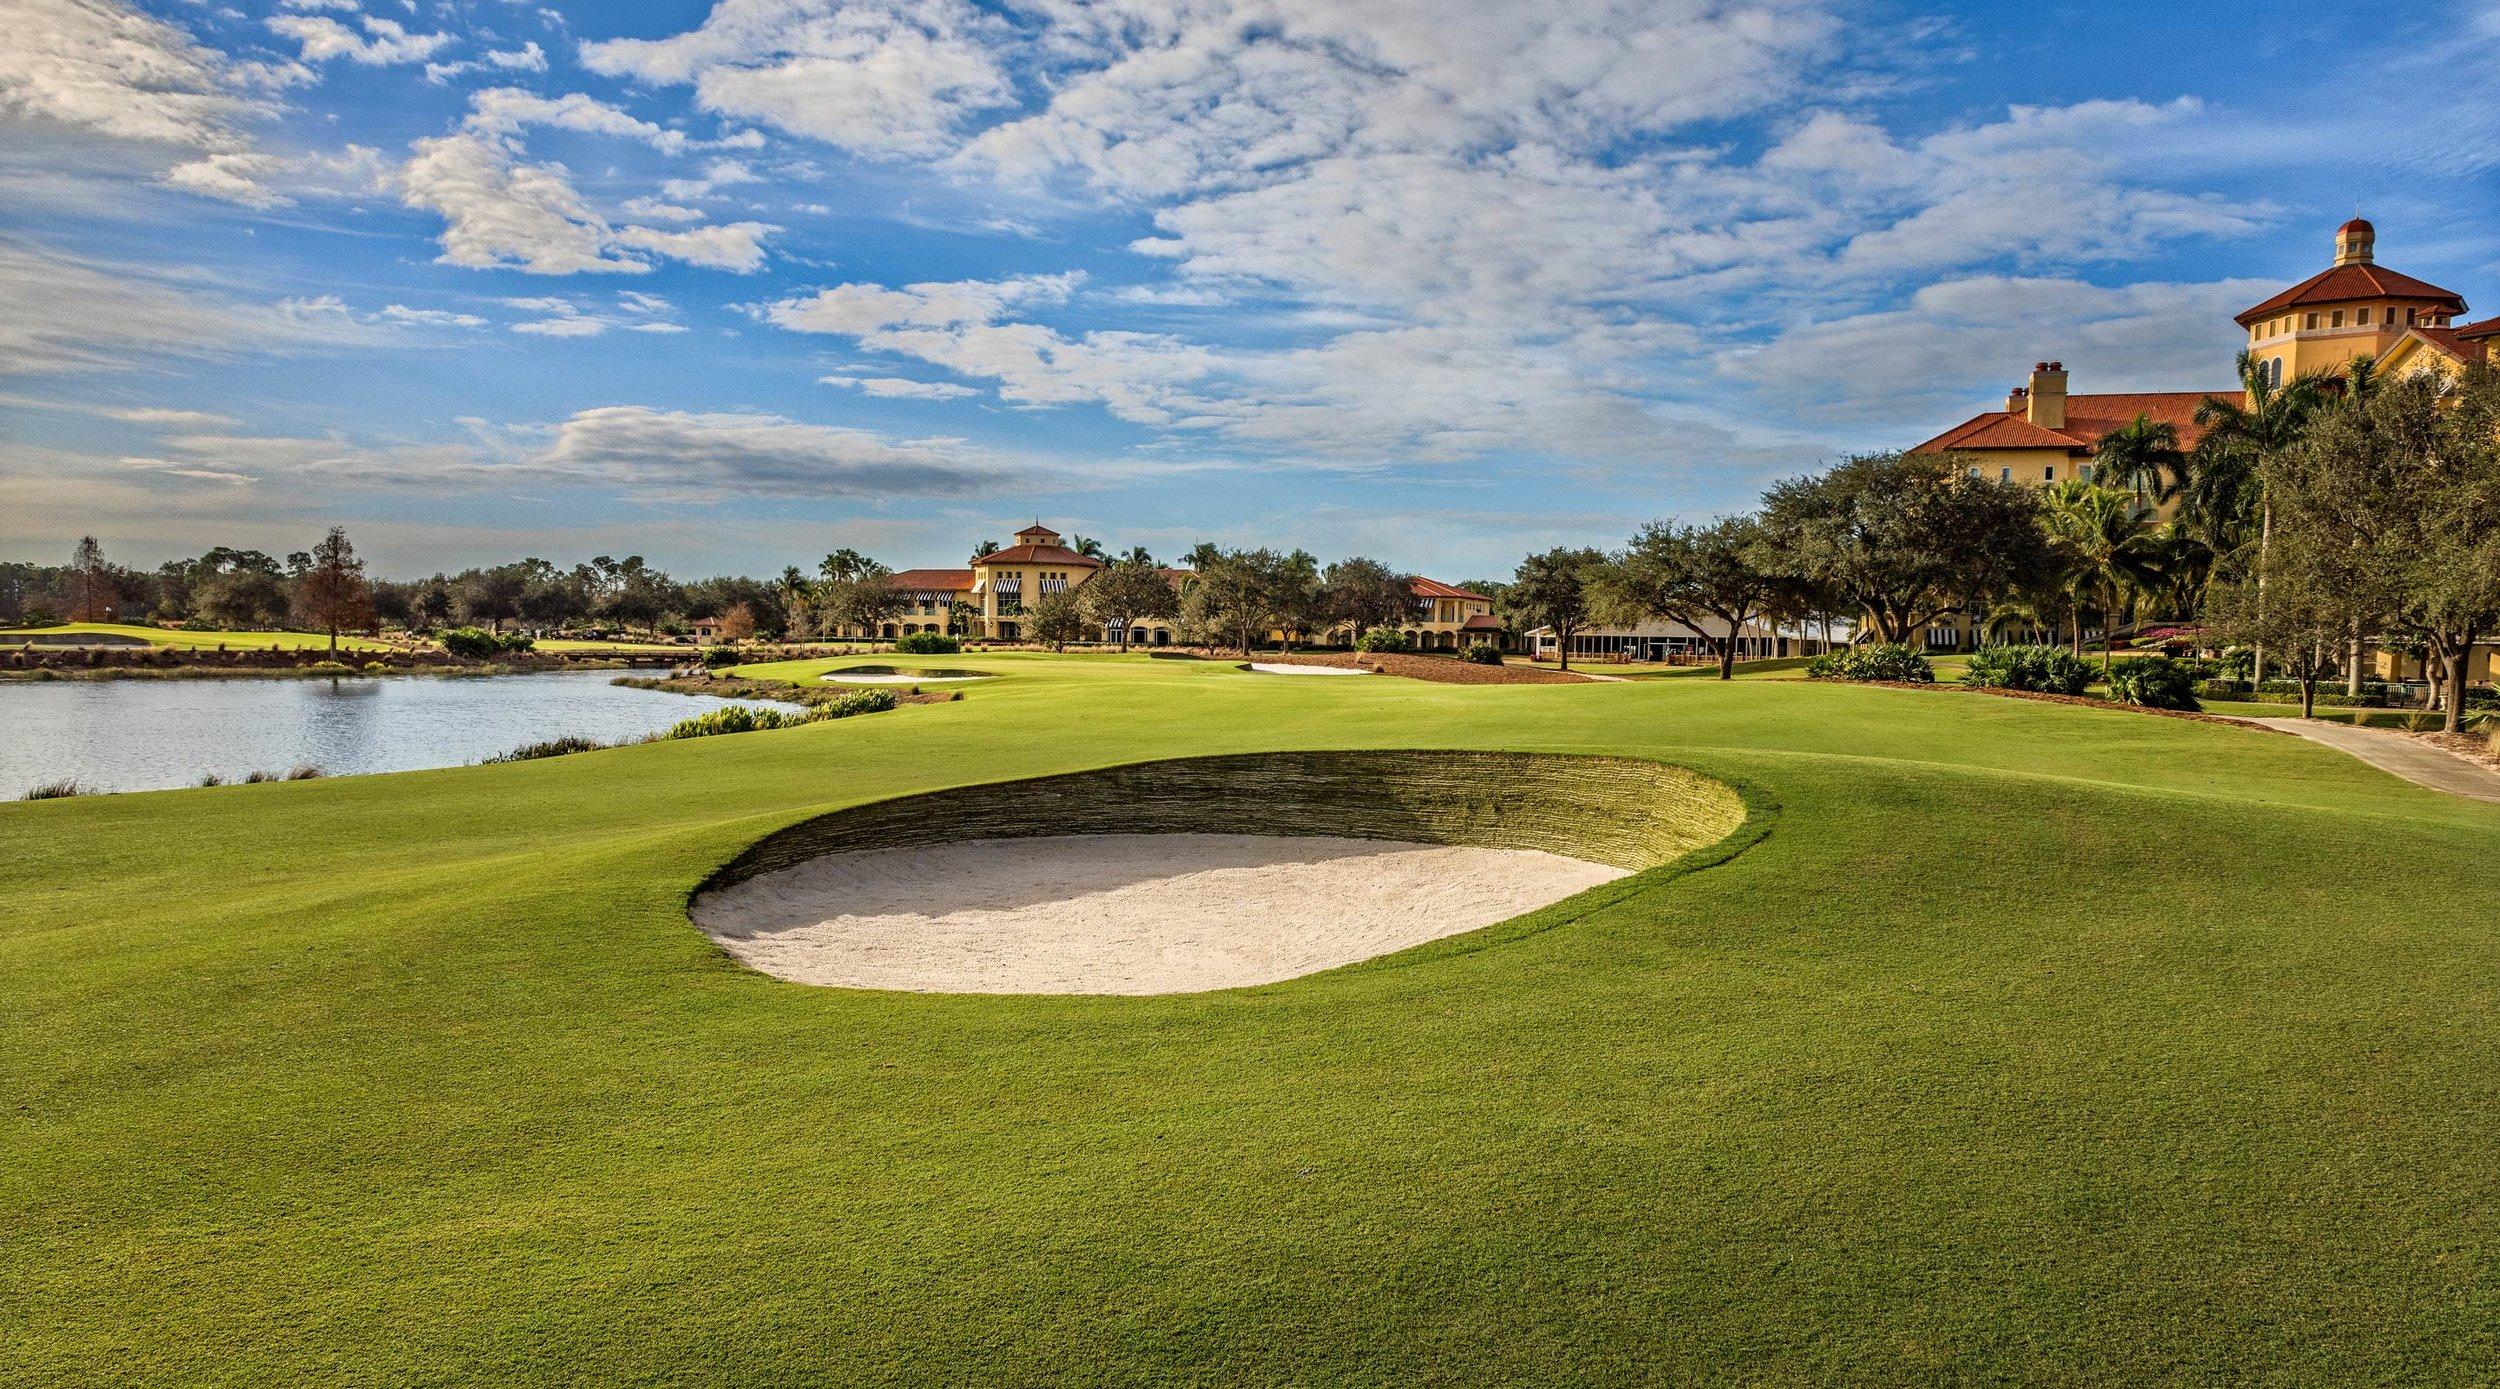 Ritz-Carlton Tiburon - Naples, Florida - USA* Resort - 36 holeswww.ritzcarlton.com